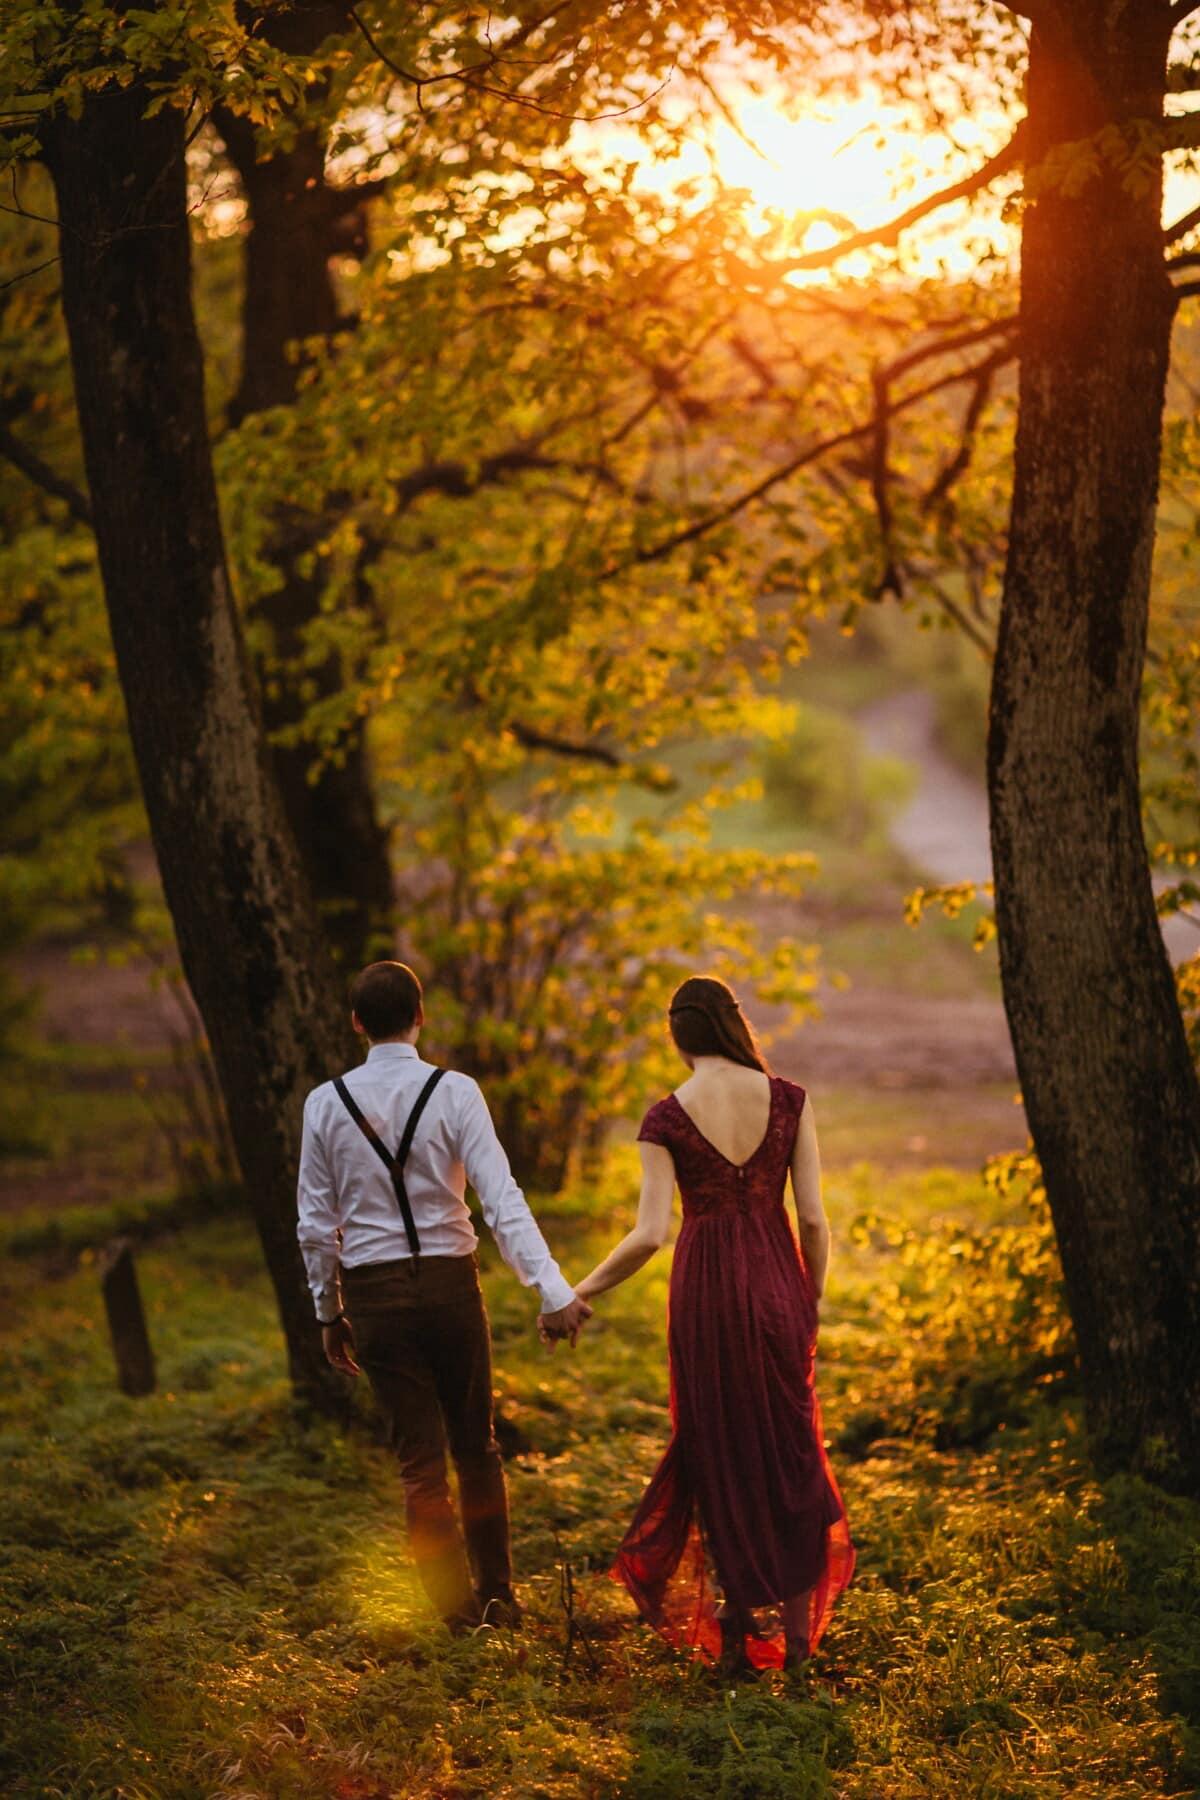 boyfriend, girlfriend, forest trail, hike, sunset, backlight, leaf, autumn, forest, tree